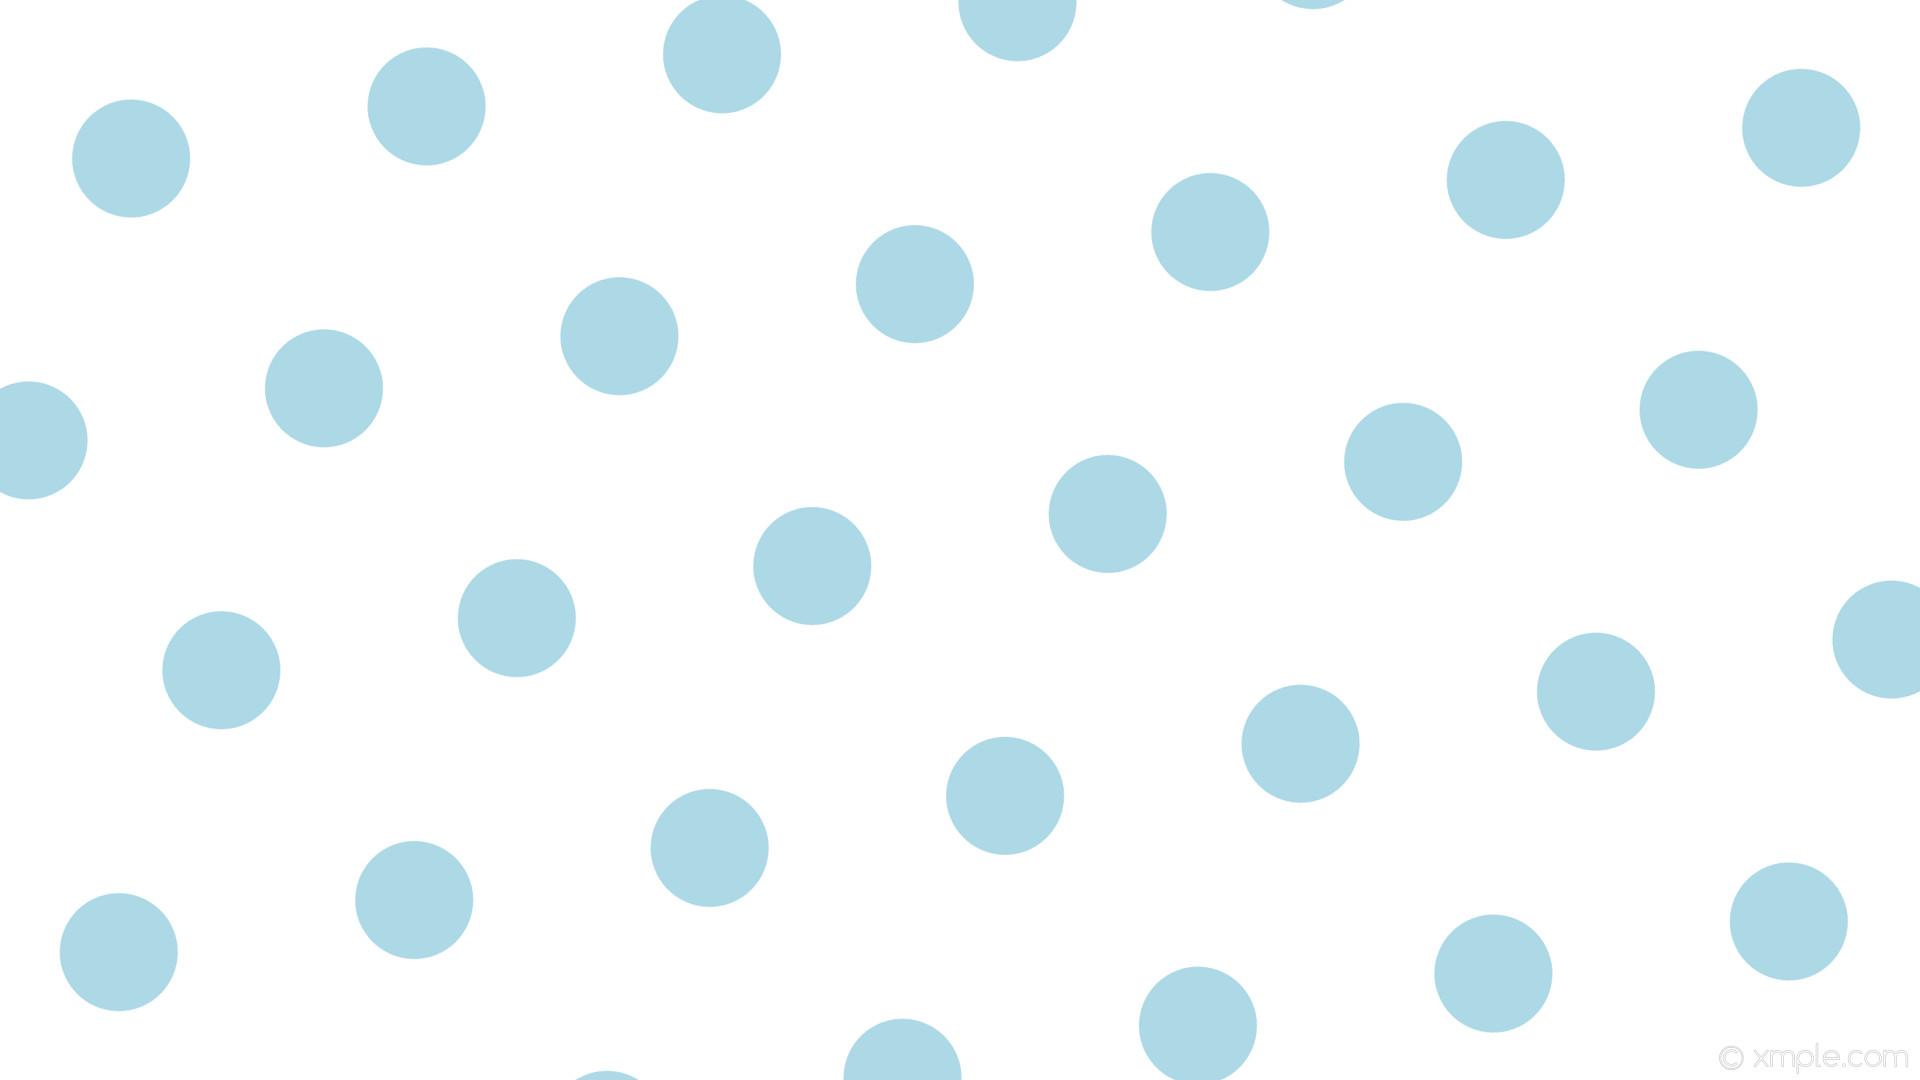 wallpaper white polka dots hexagon blue light blue #ffffff #add8e6 diagonal  10° 118px